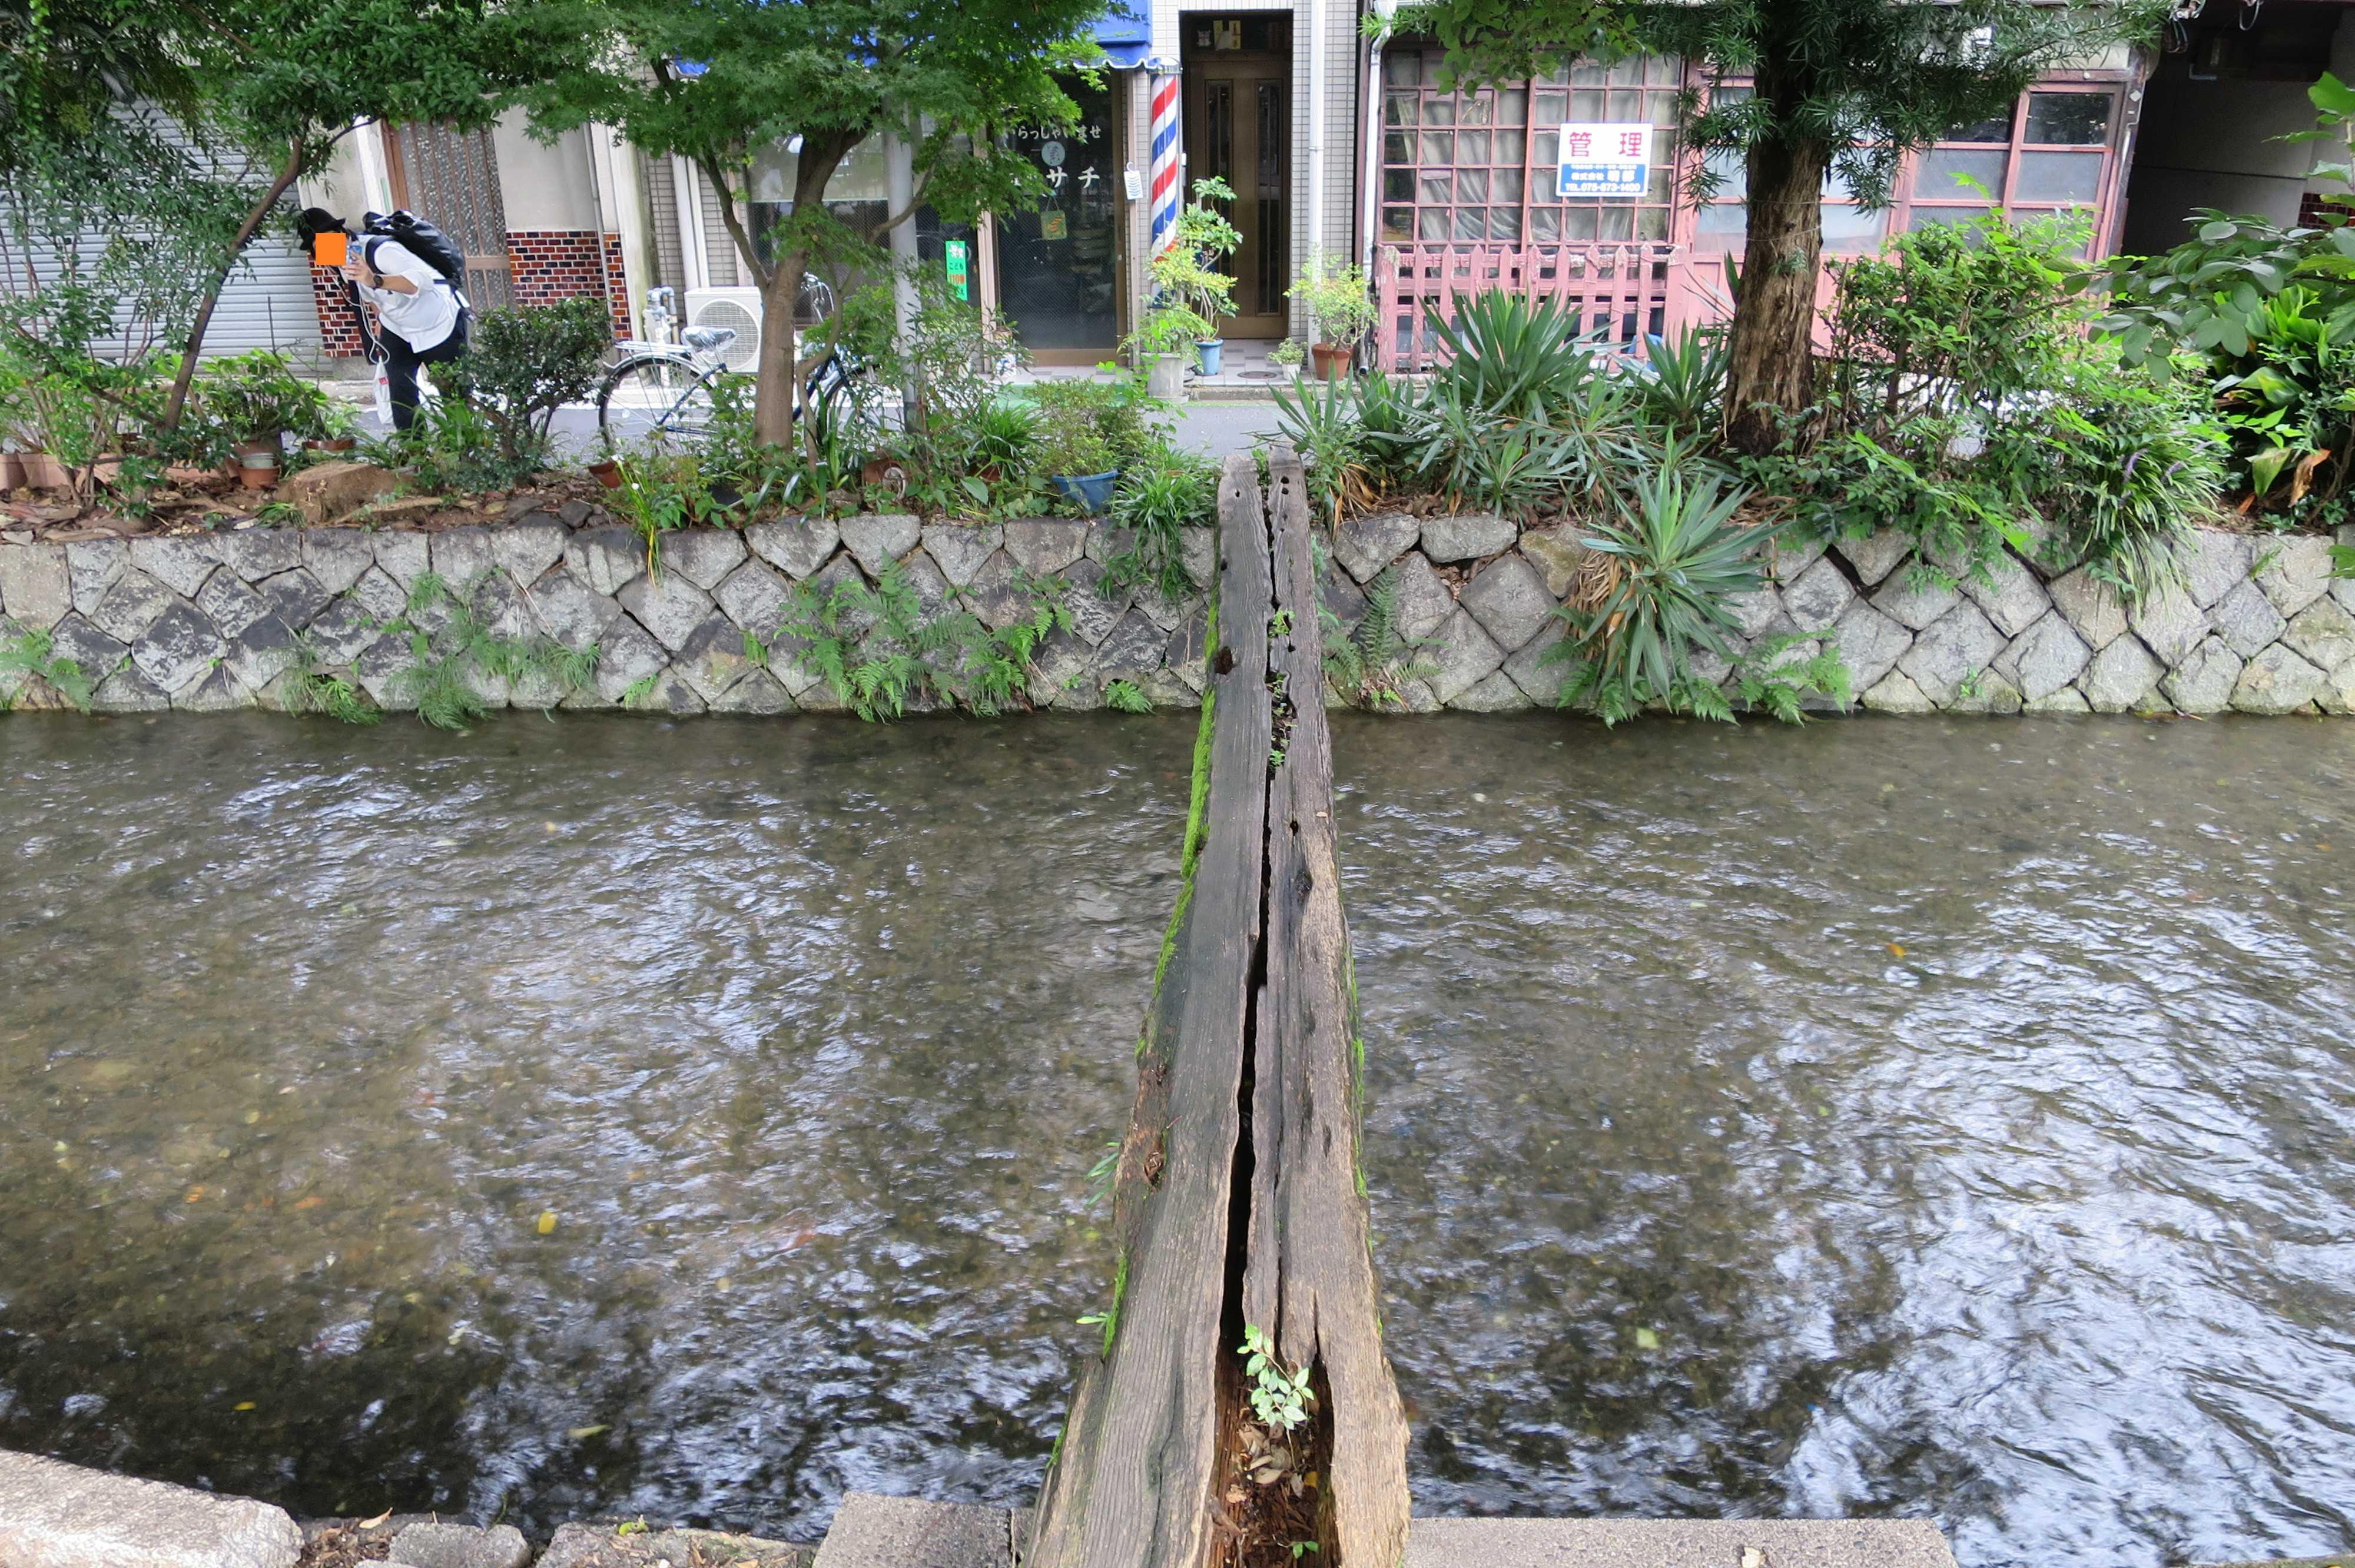 京都・五条楽園 - 高瀬川の一本橋